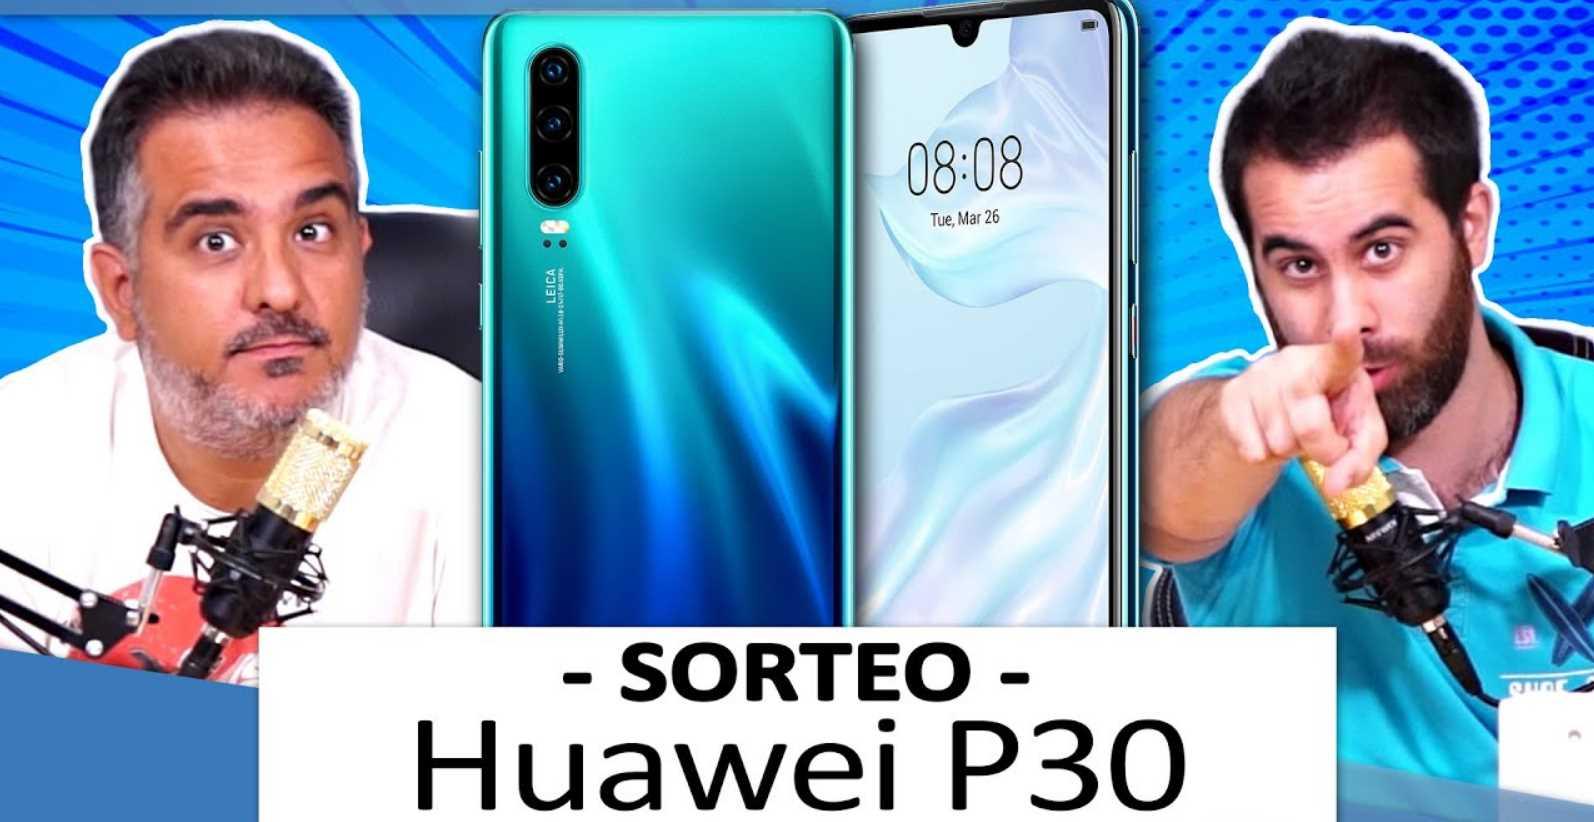 ¡Sorteamos un Huawei P30!